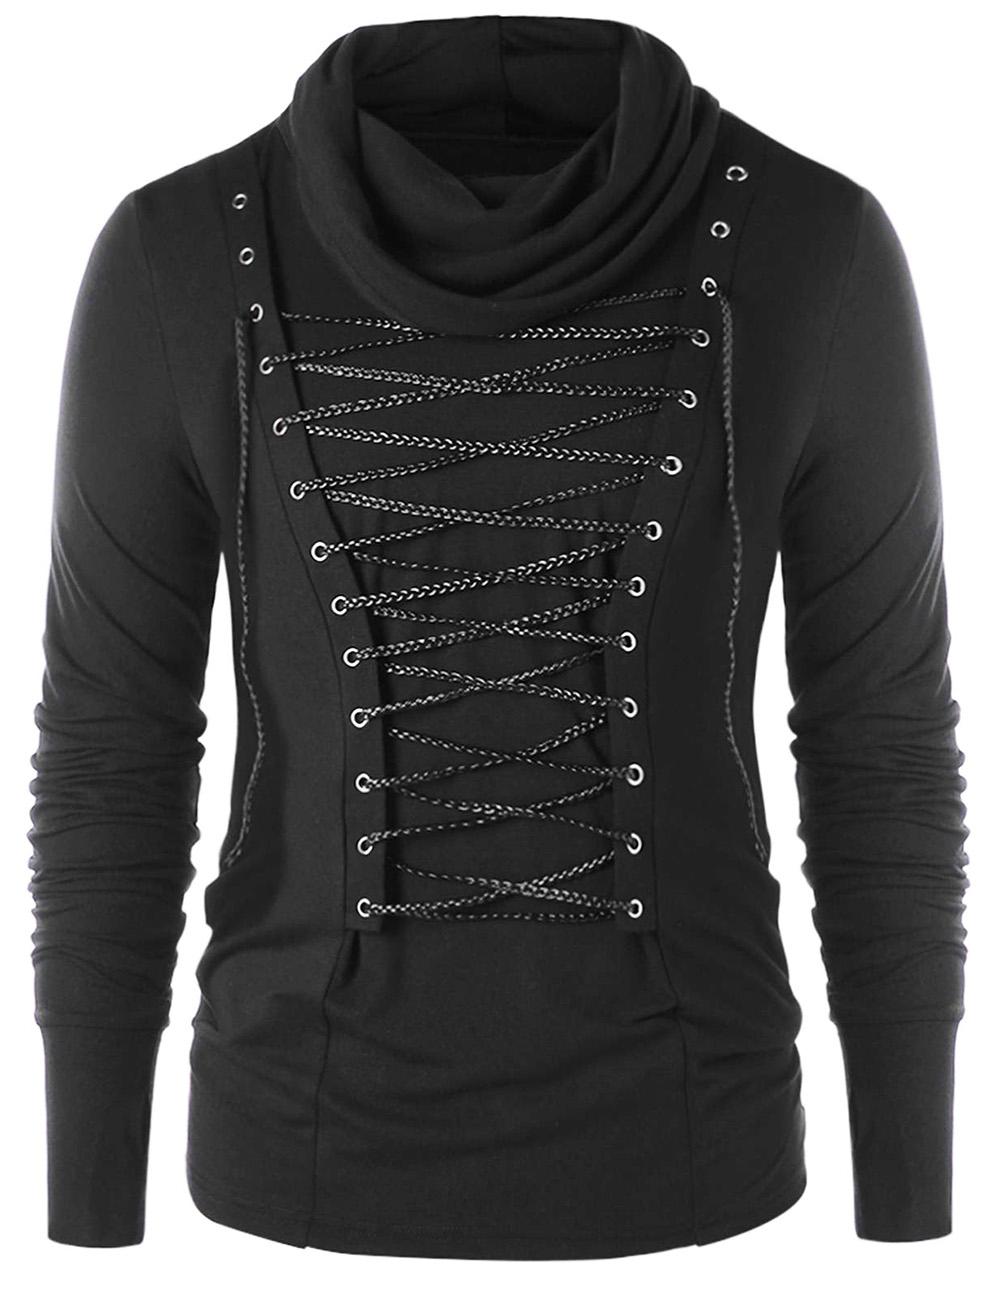 Men Stylish Slim Thermal High Collar Long Sleeve Knitwear Braided Rope Decoration Sweater Tops Stretch Shirt black_L